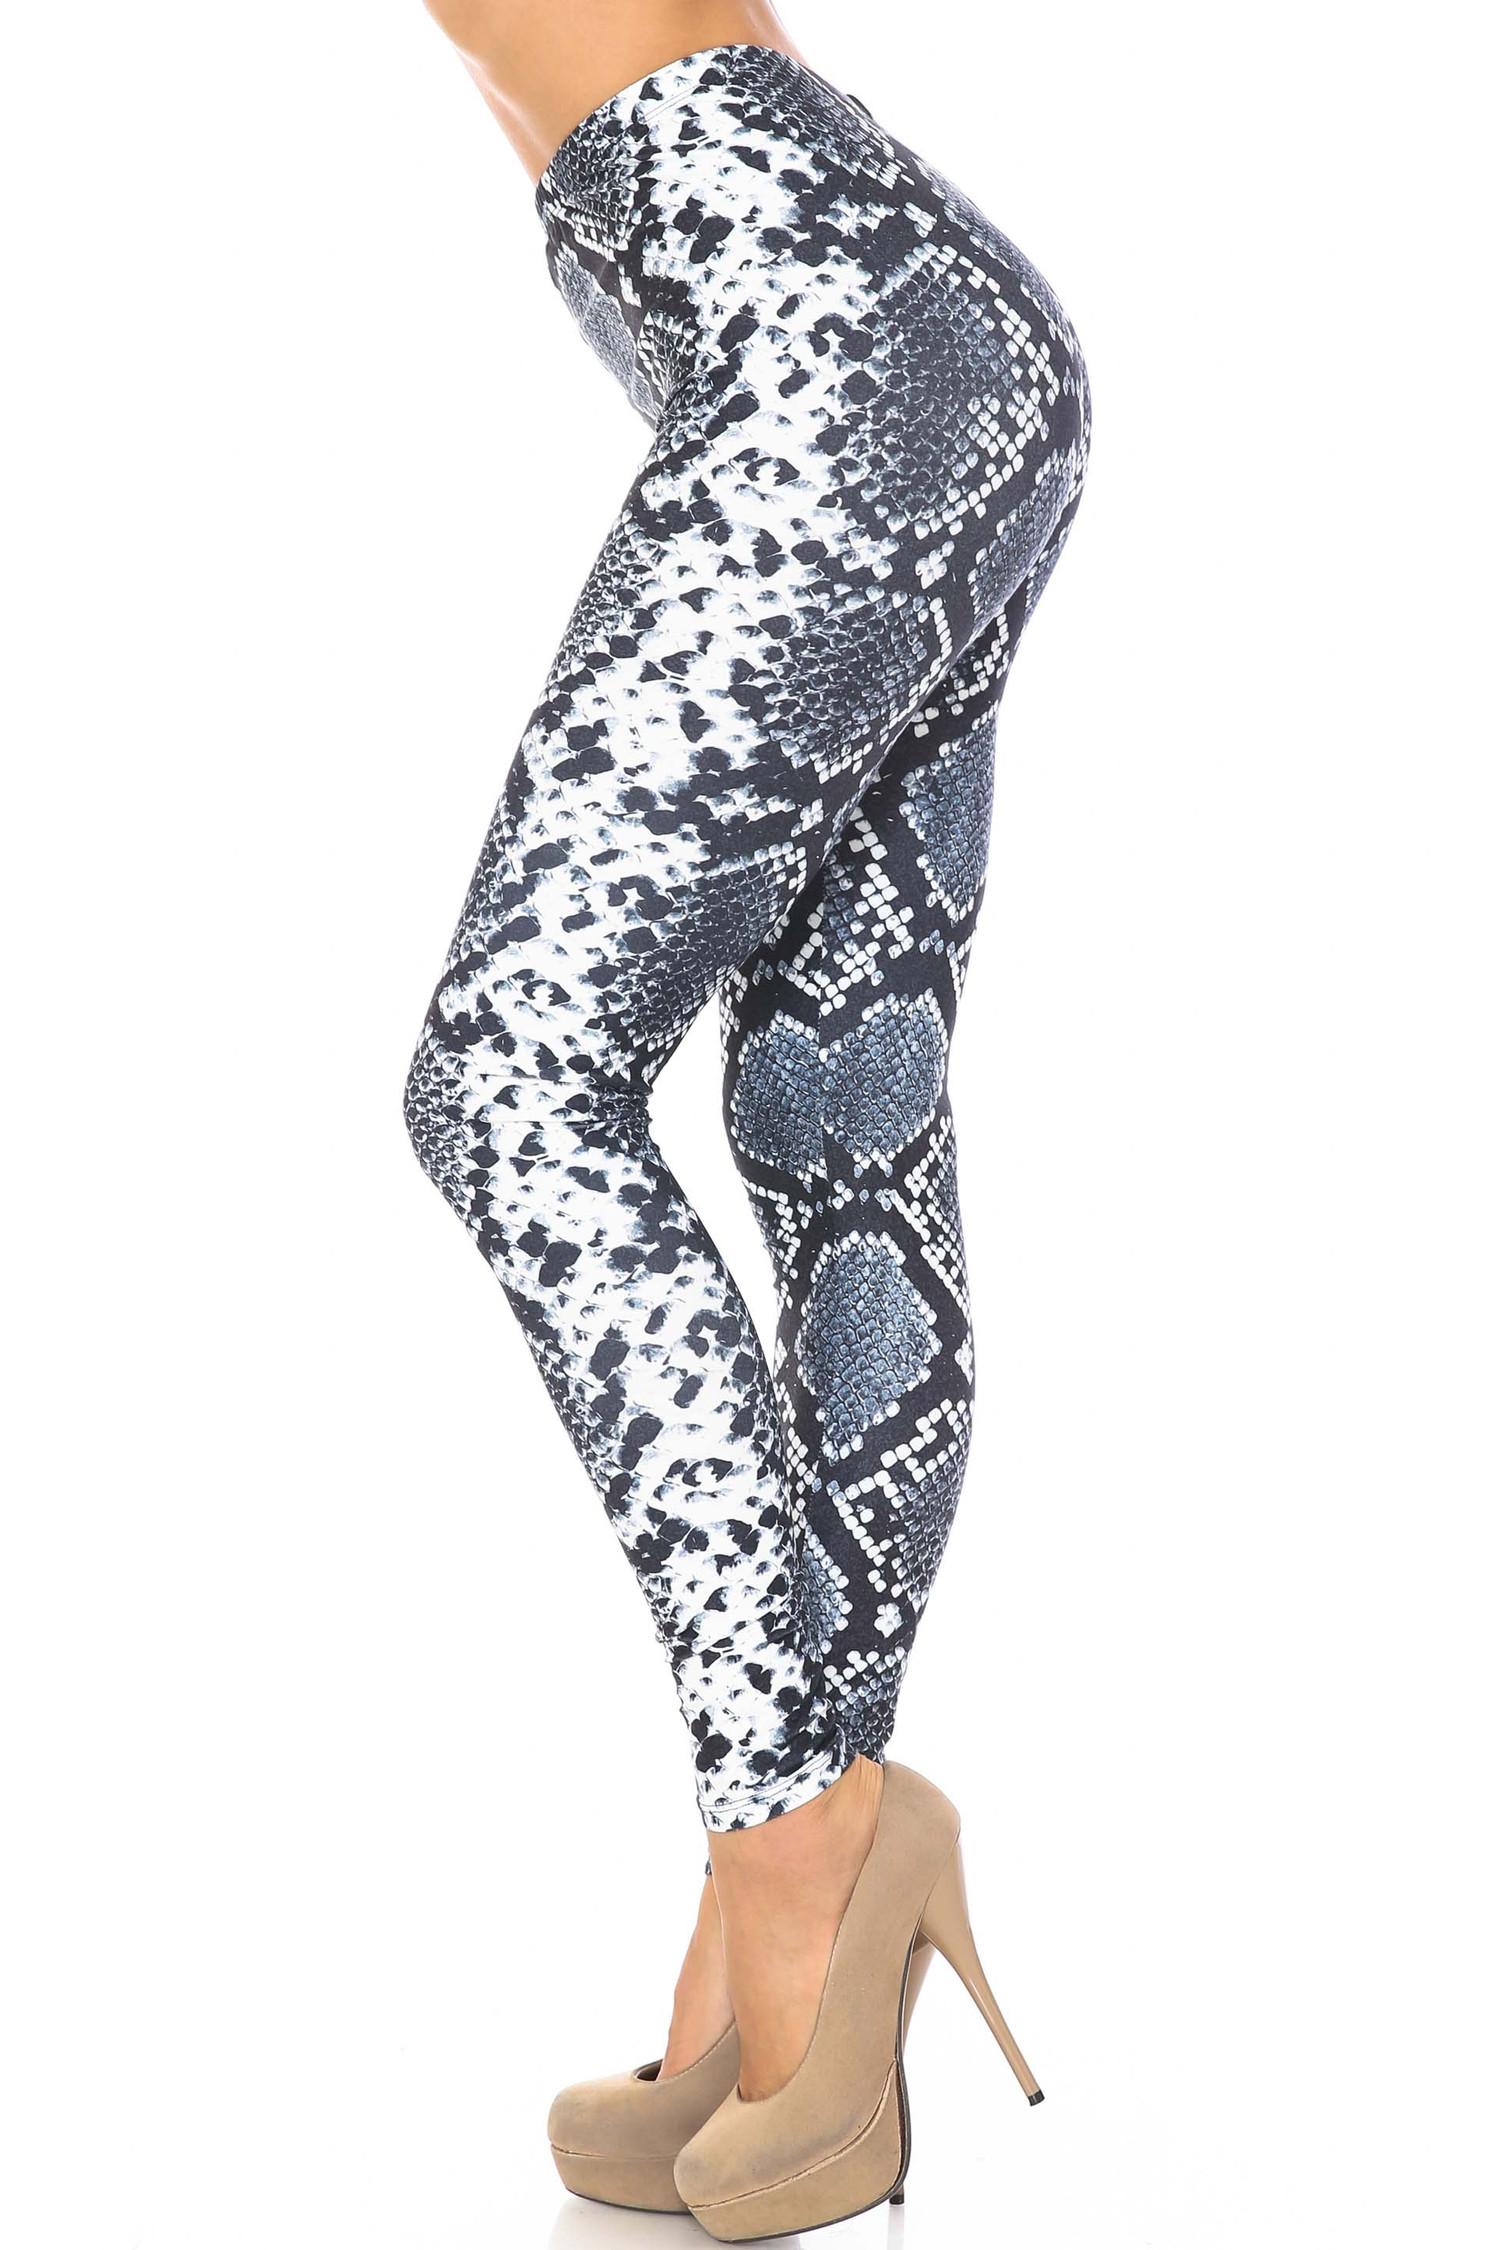 Left side of Creamy Soft Steel Blue Boa Extra Plus Size Leggings - 3X-5X - USA Fashion™